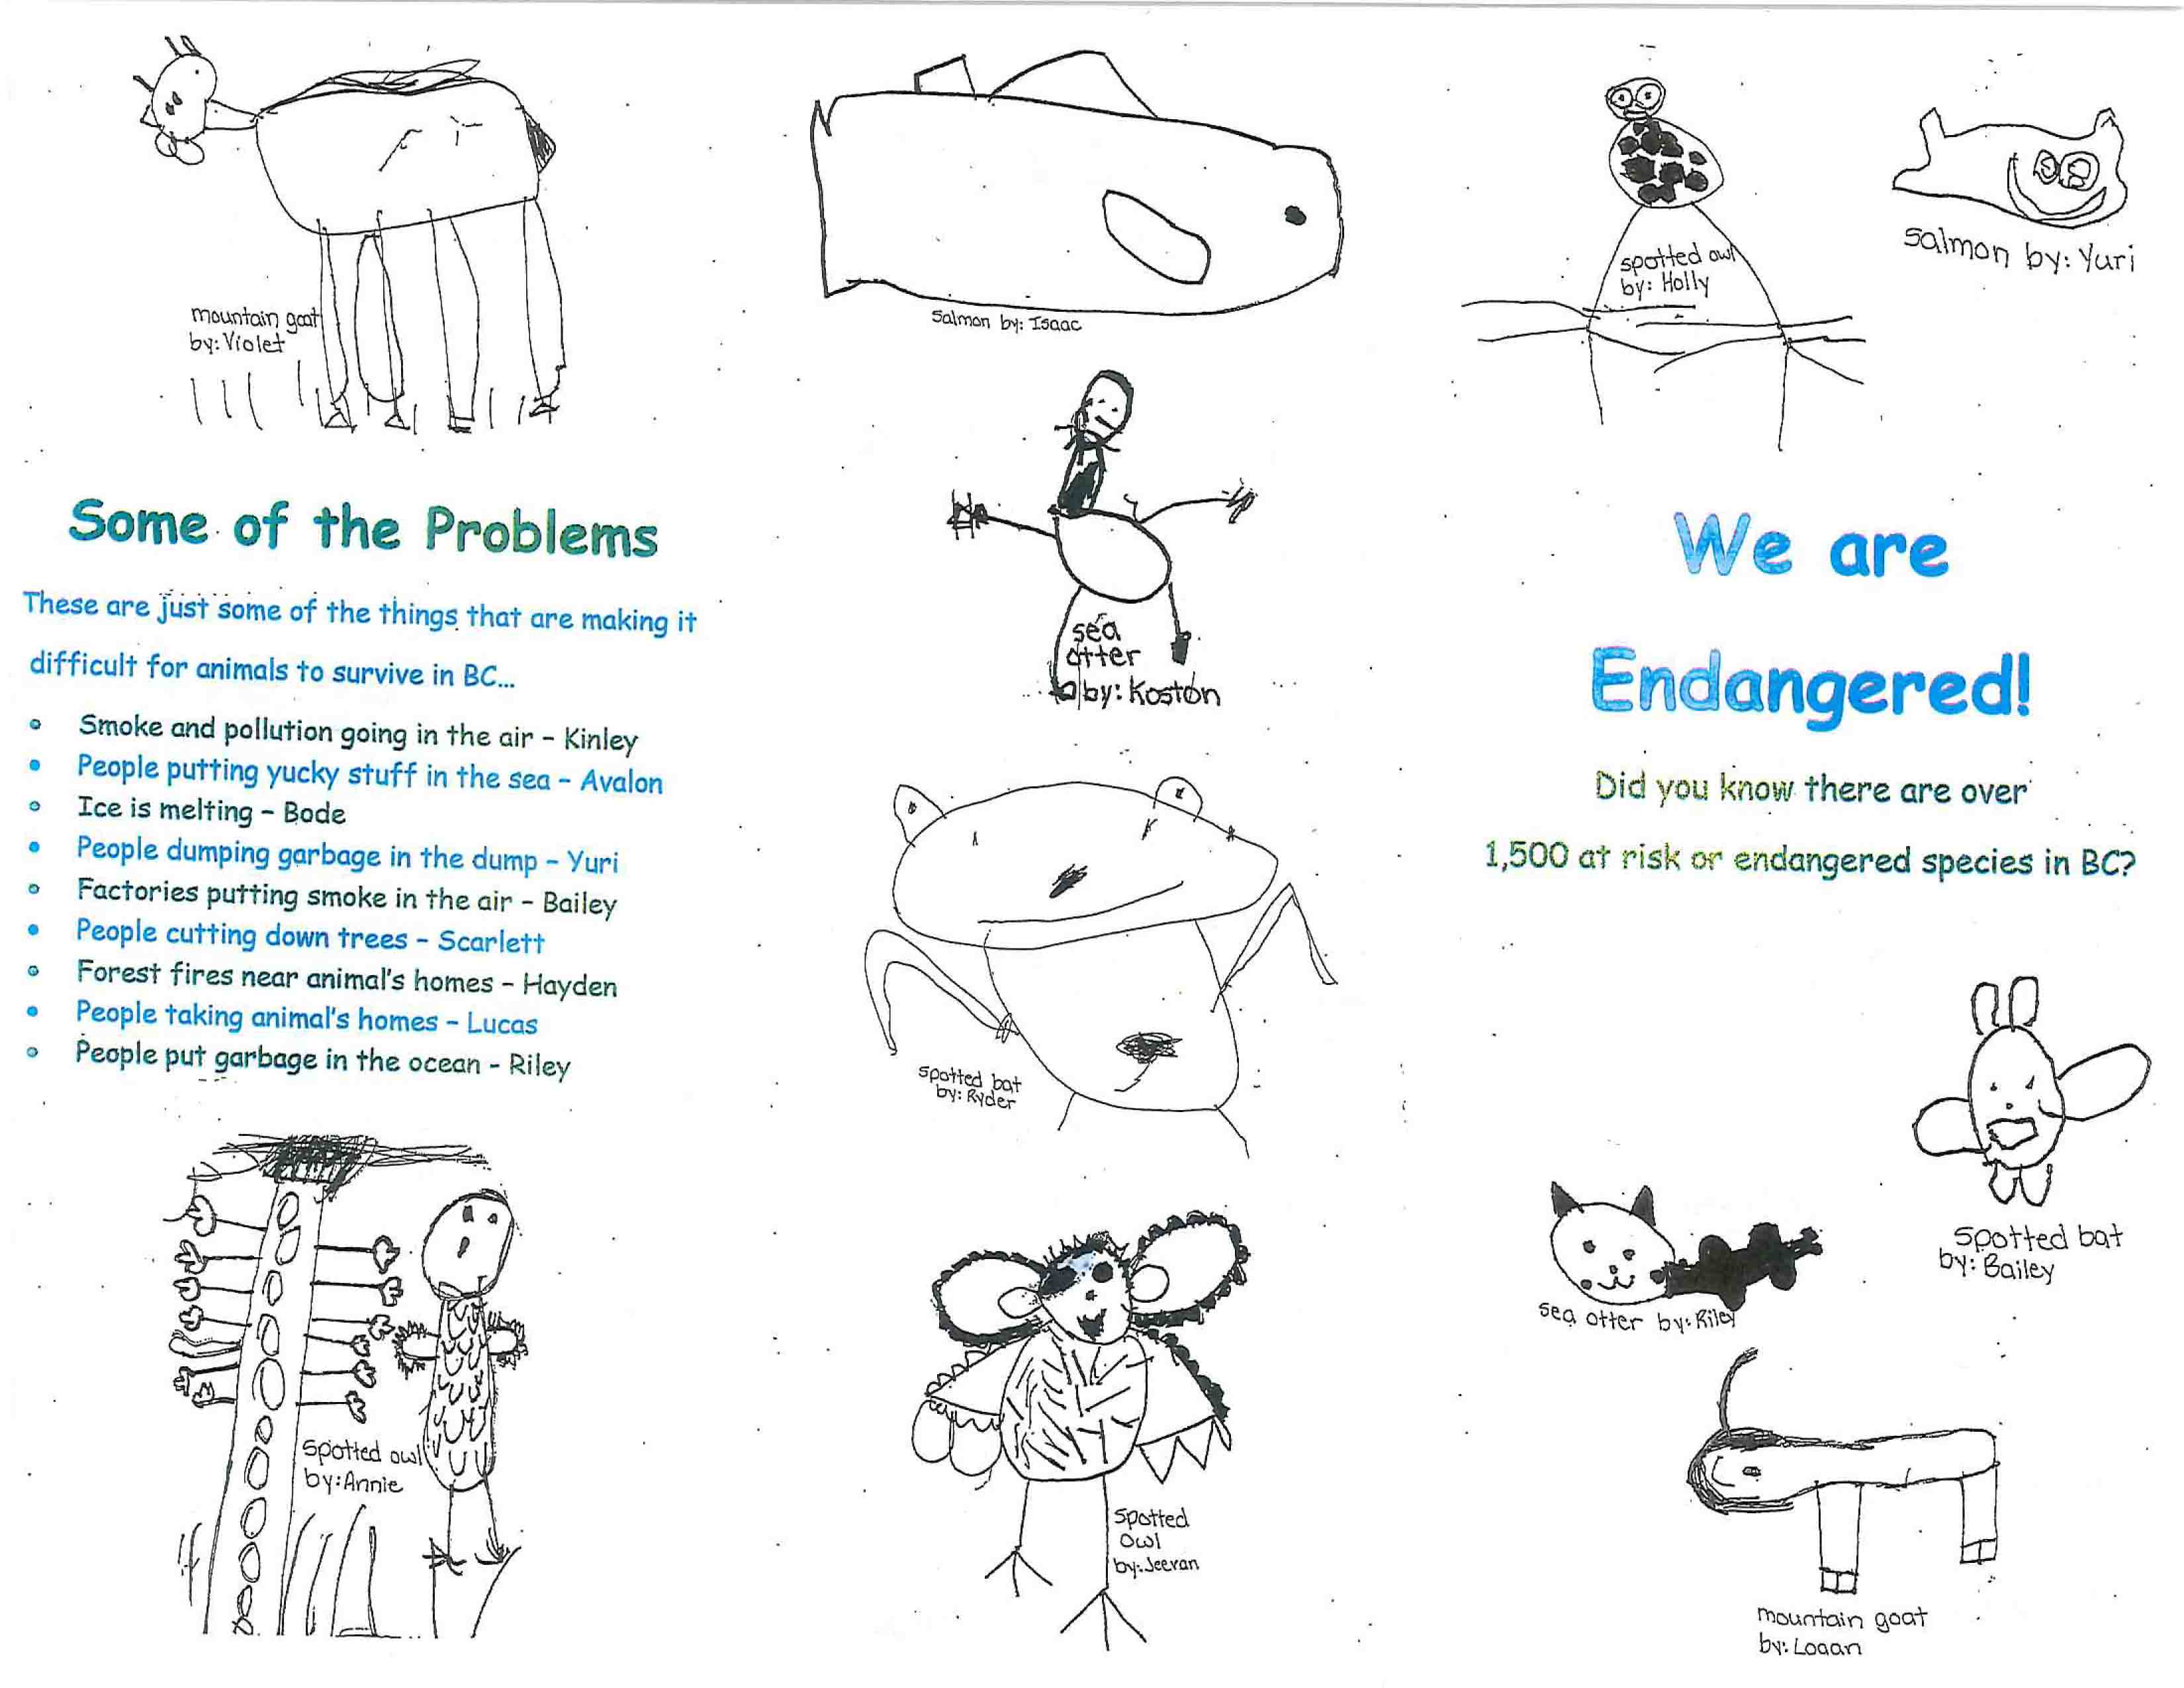 endangered-species-brochure_mrs-bowleys-kindergarten-class-at-brackendale-elementary-1